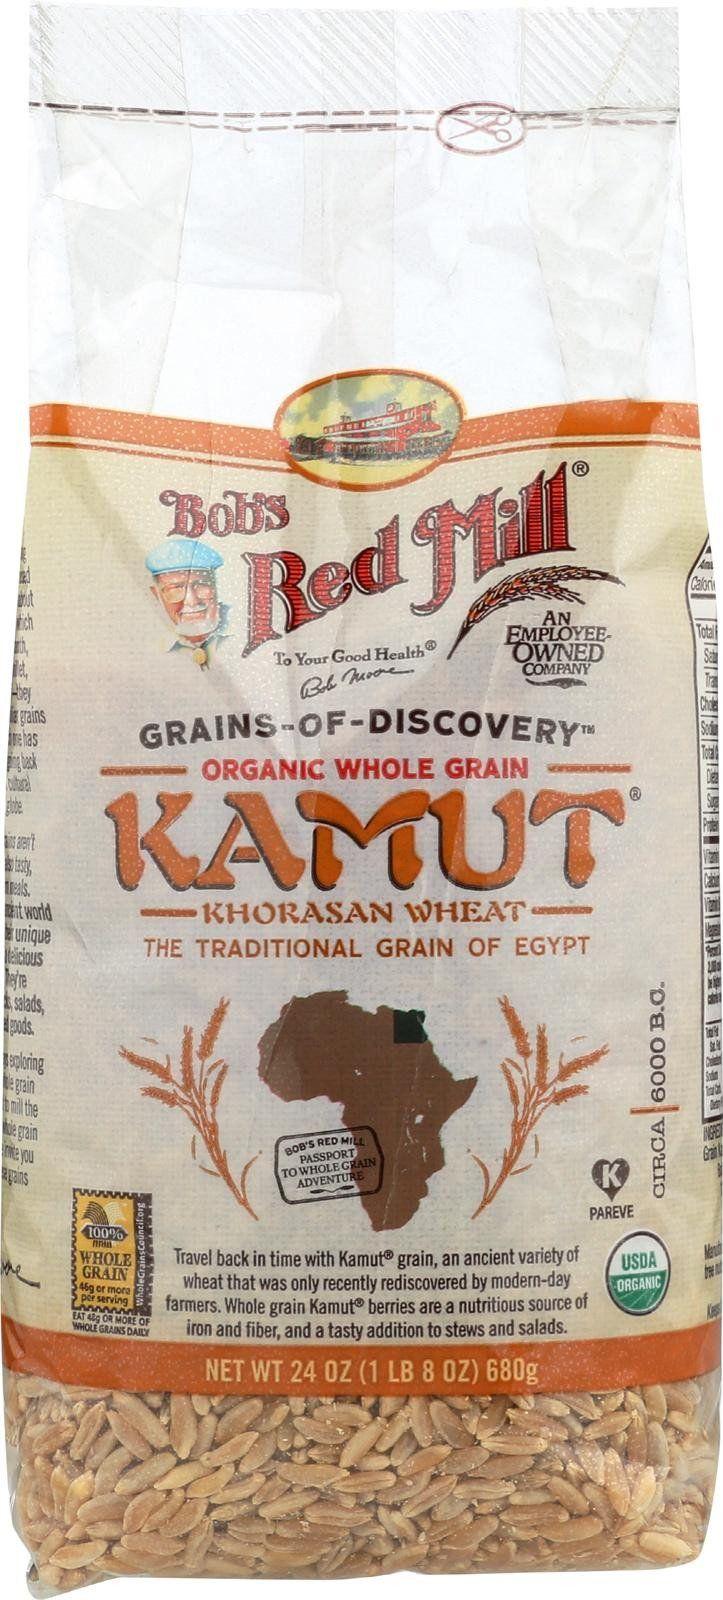 Bob's Red Mill Organic Kamut(r) Khorasan Wheat Berries - 24 Oz - Case Of 4